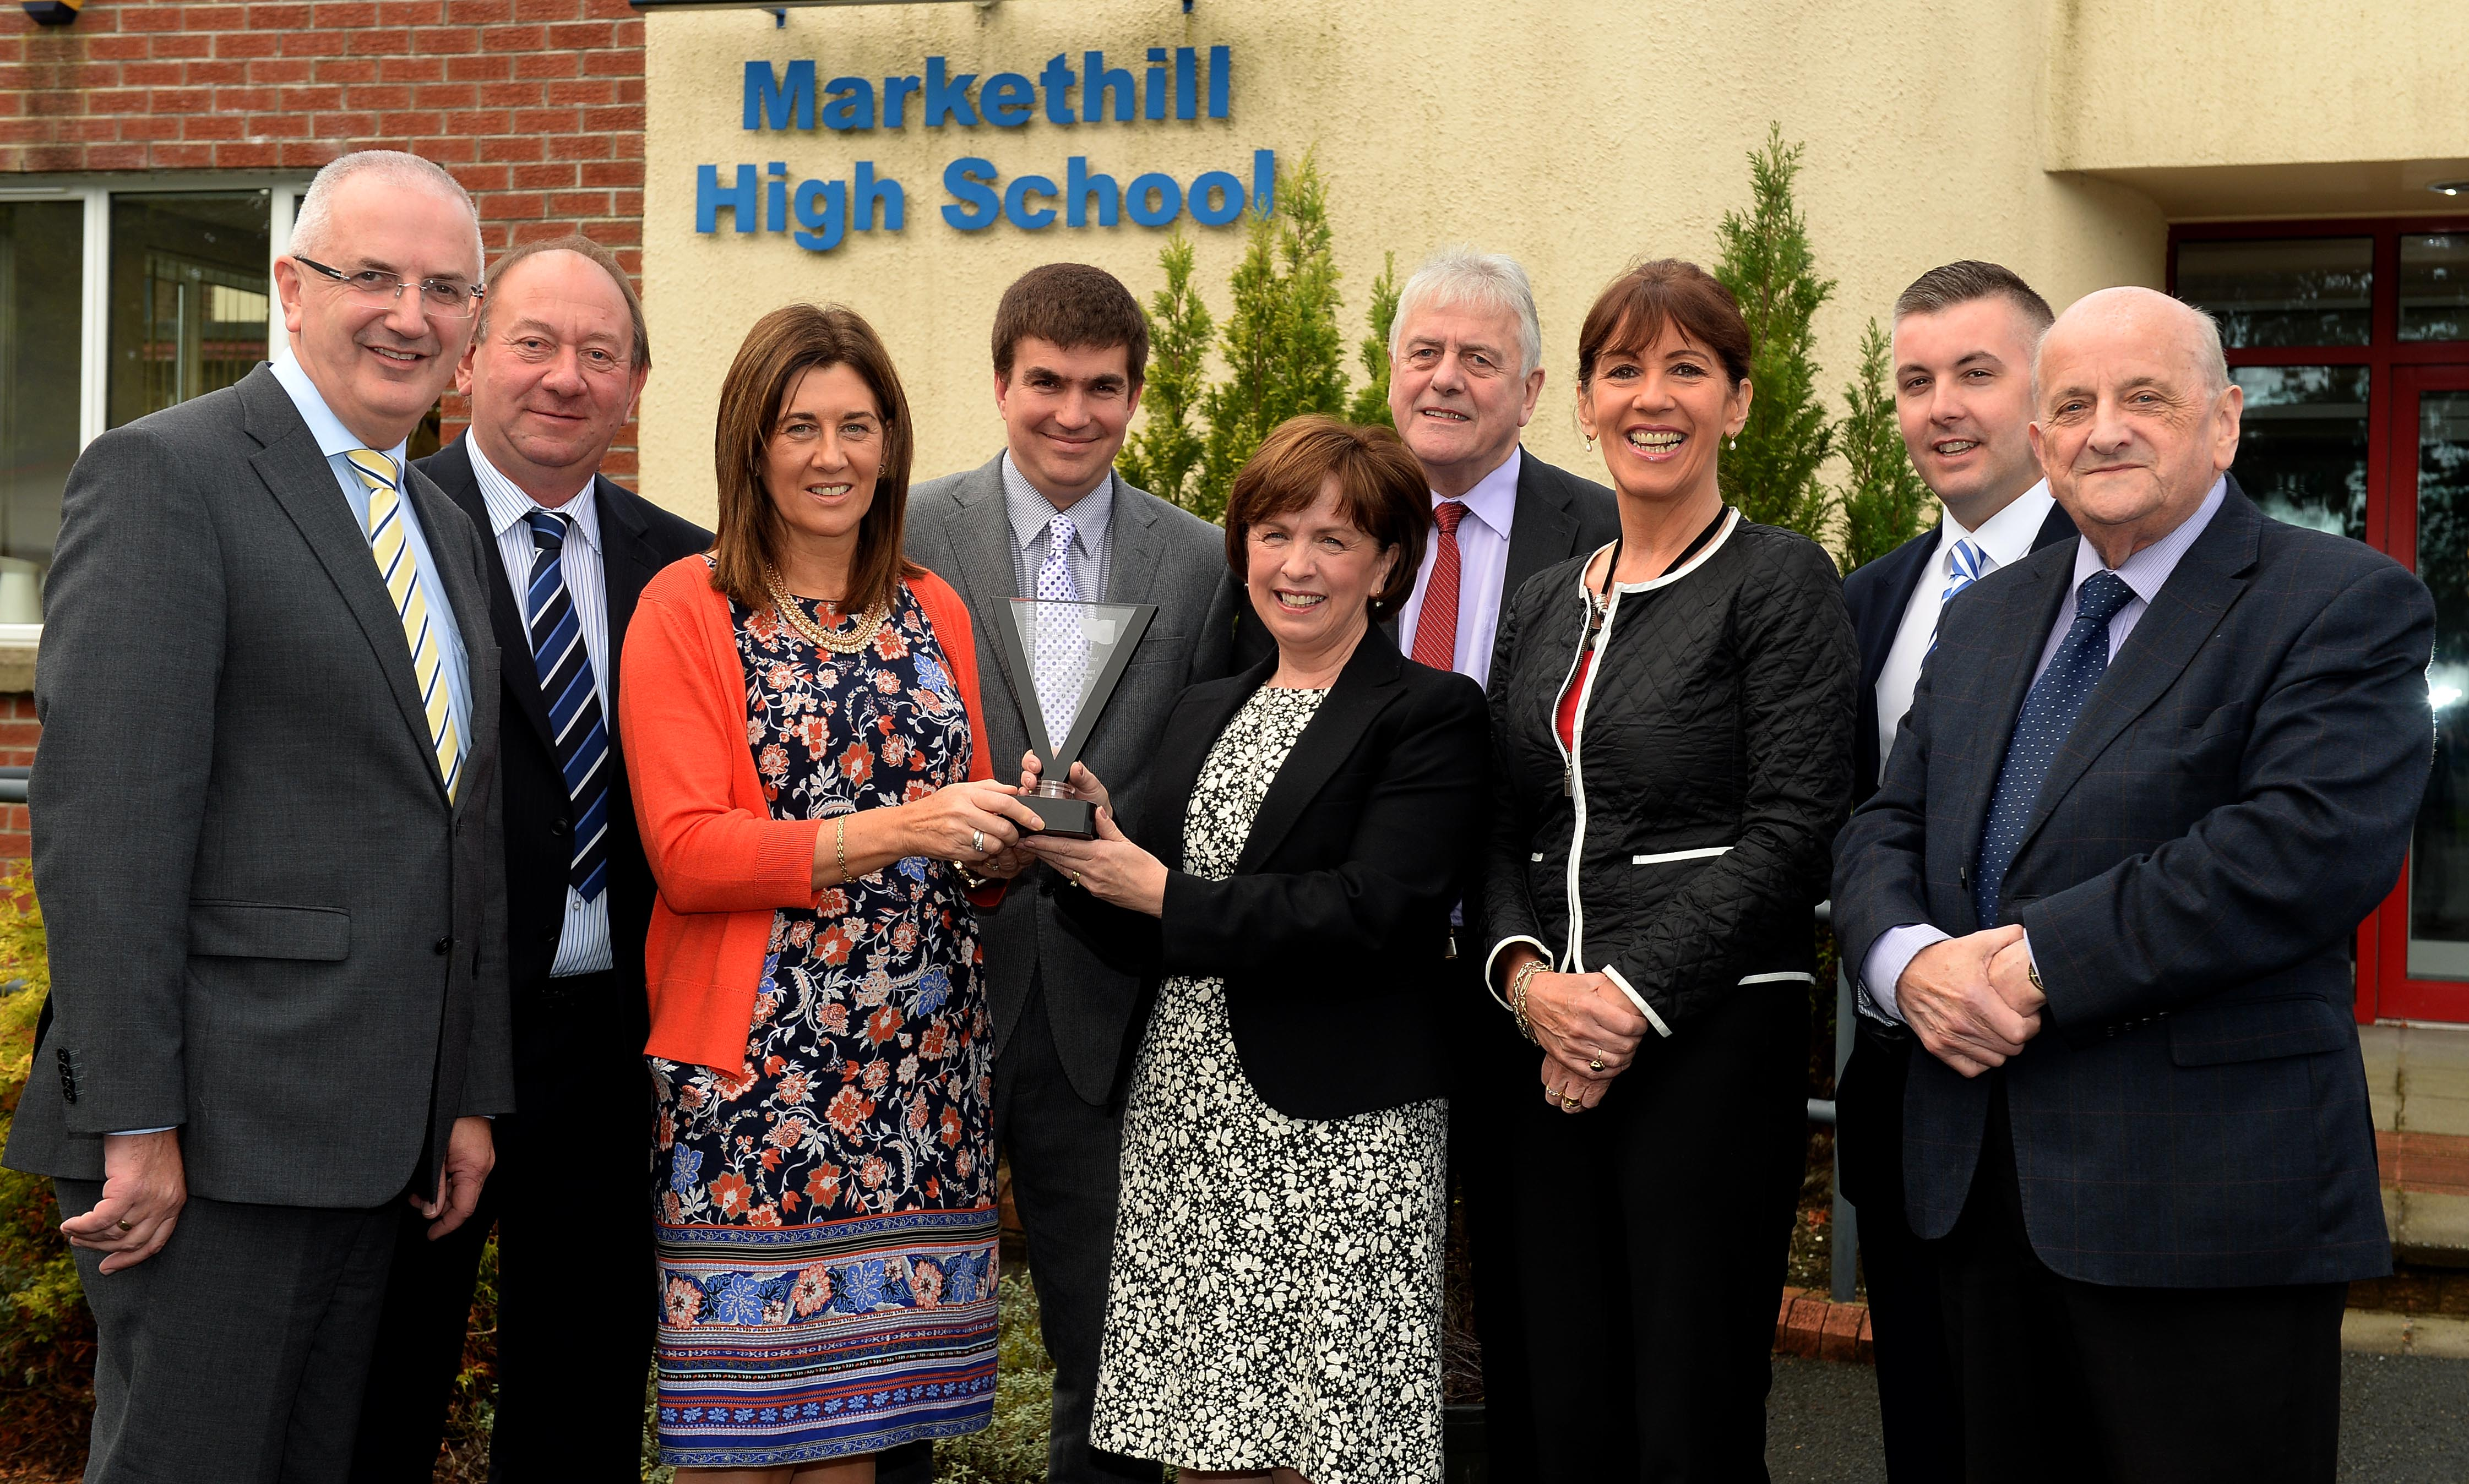 Markethill High School Wins International School Award